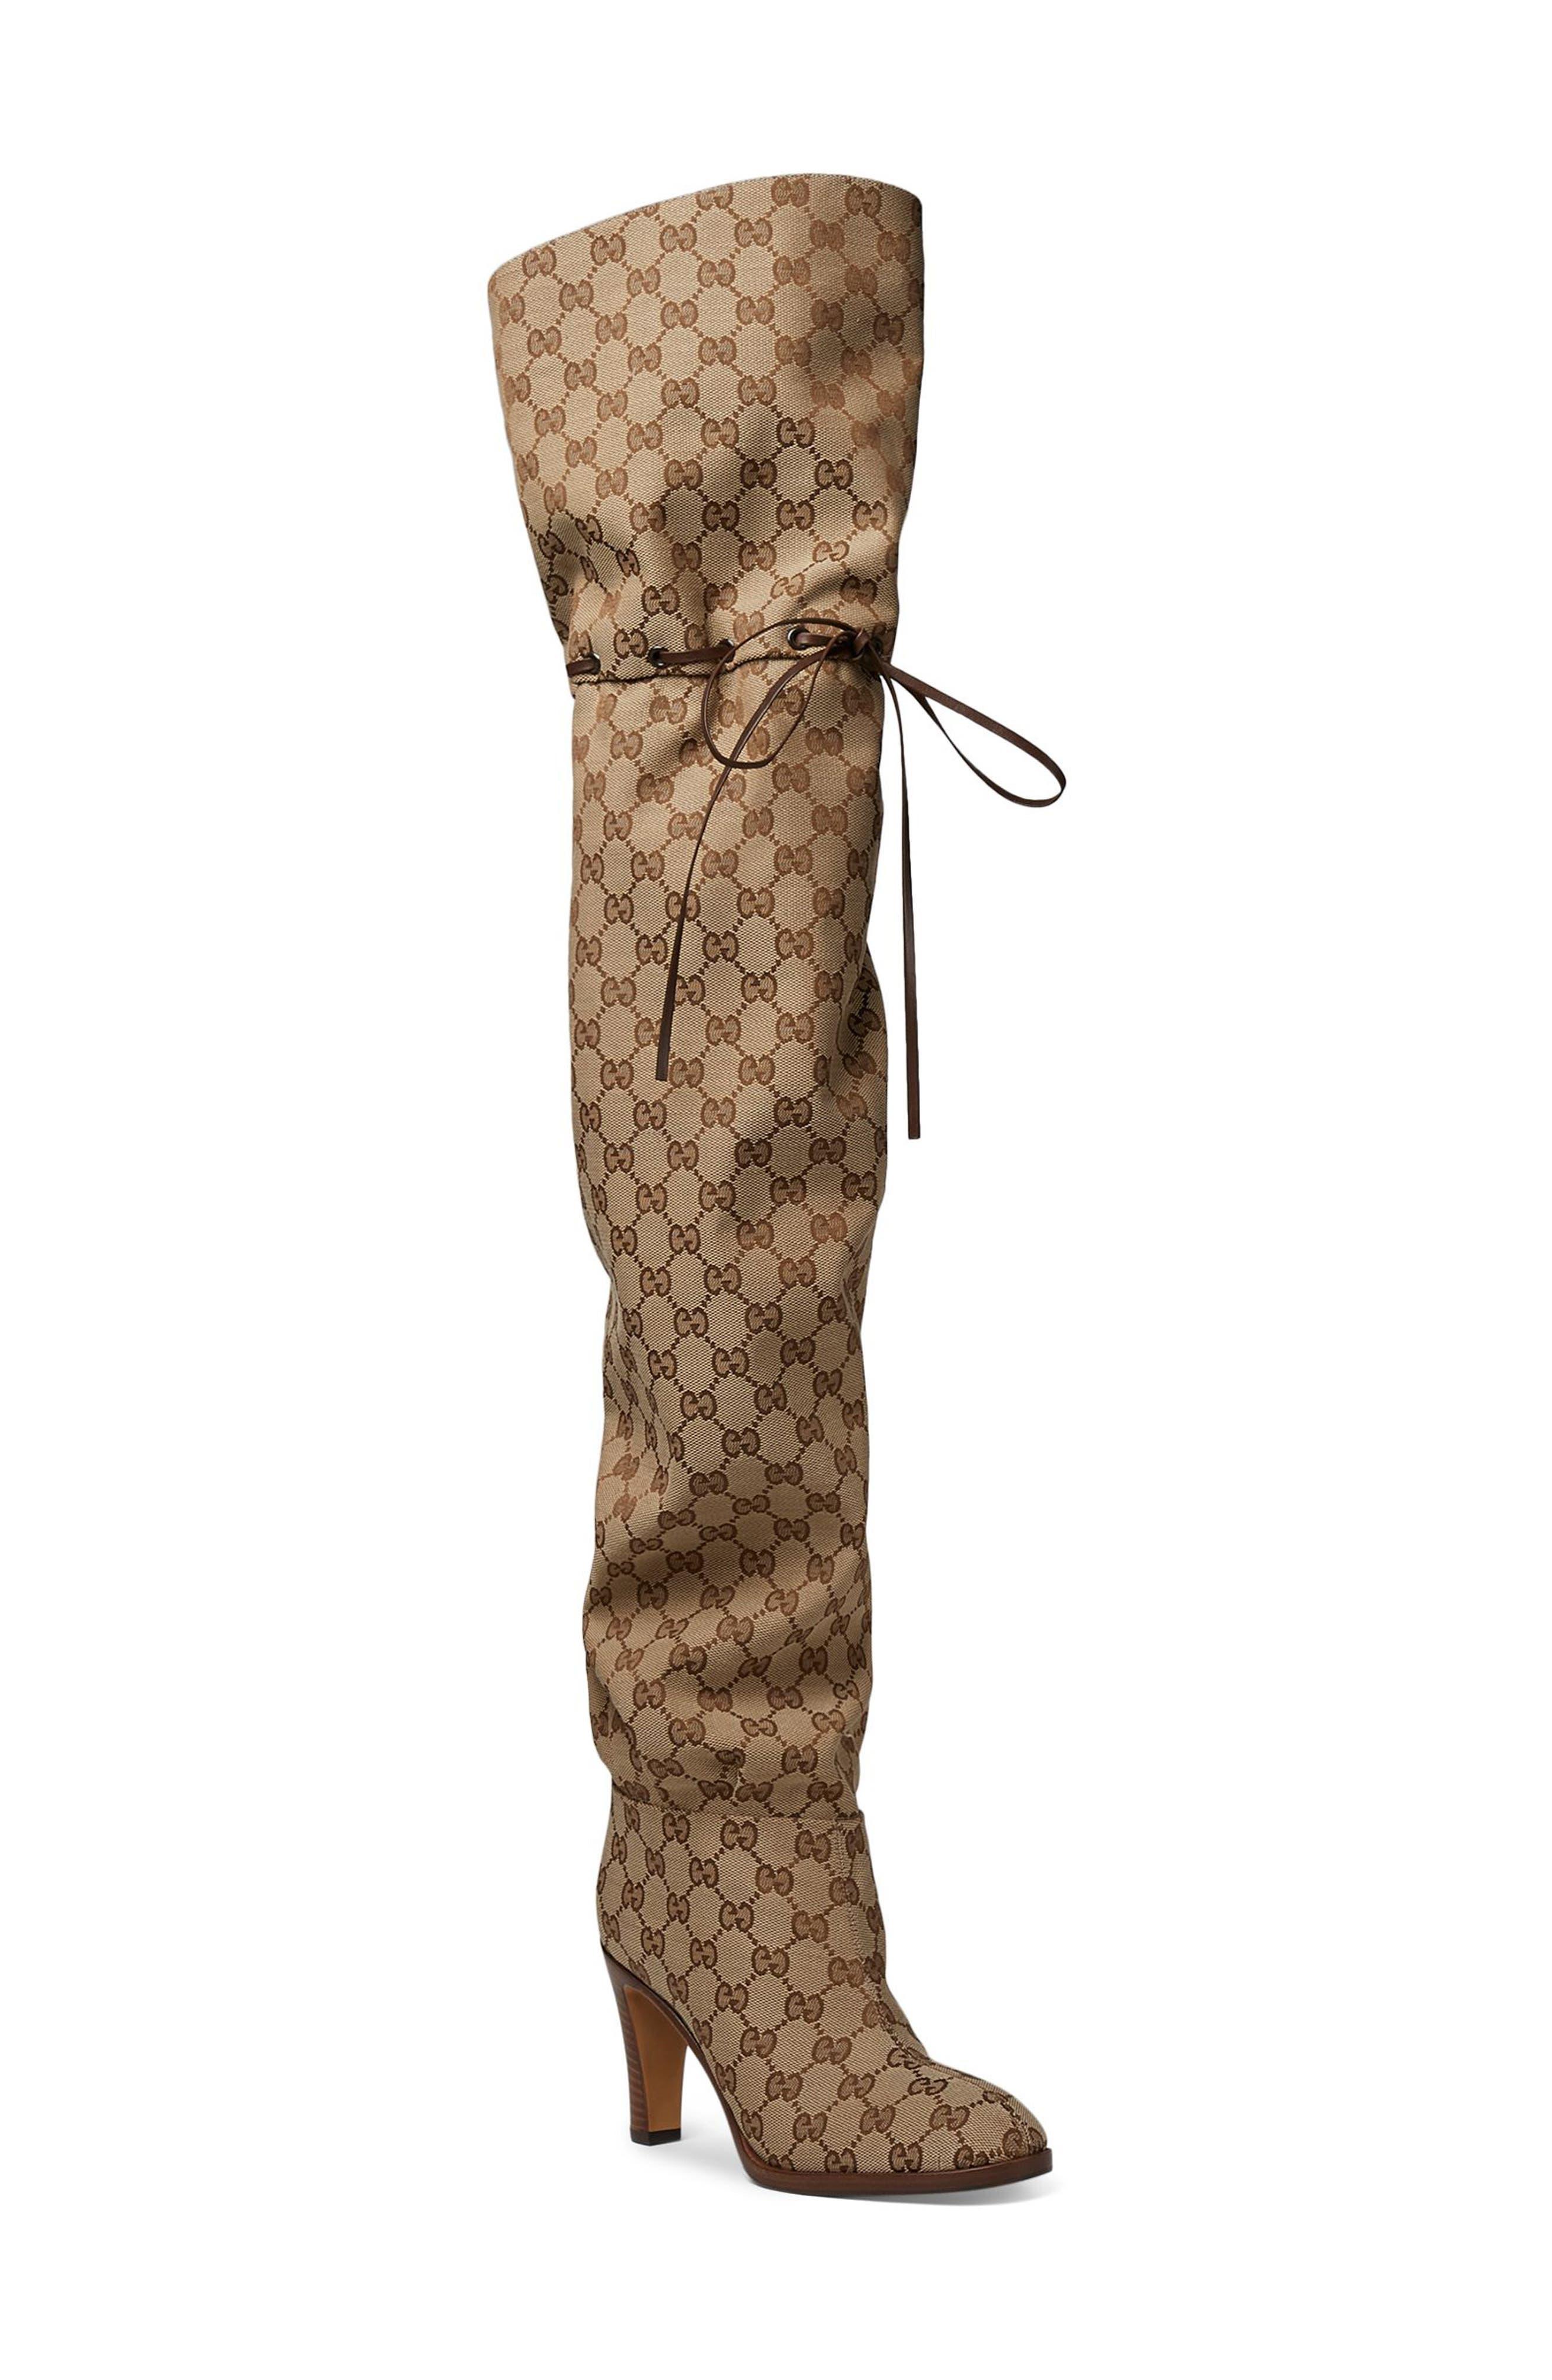 aeacde5353f Gucci Original Gg Canvas Over The Knee Boot